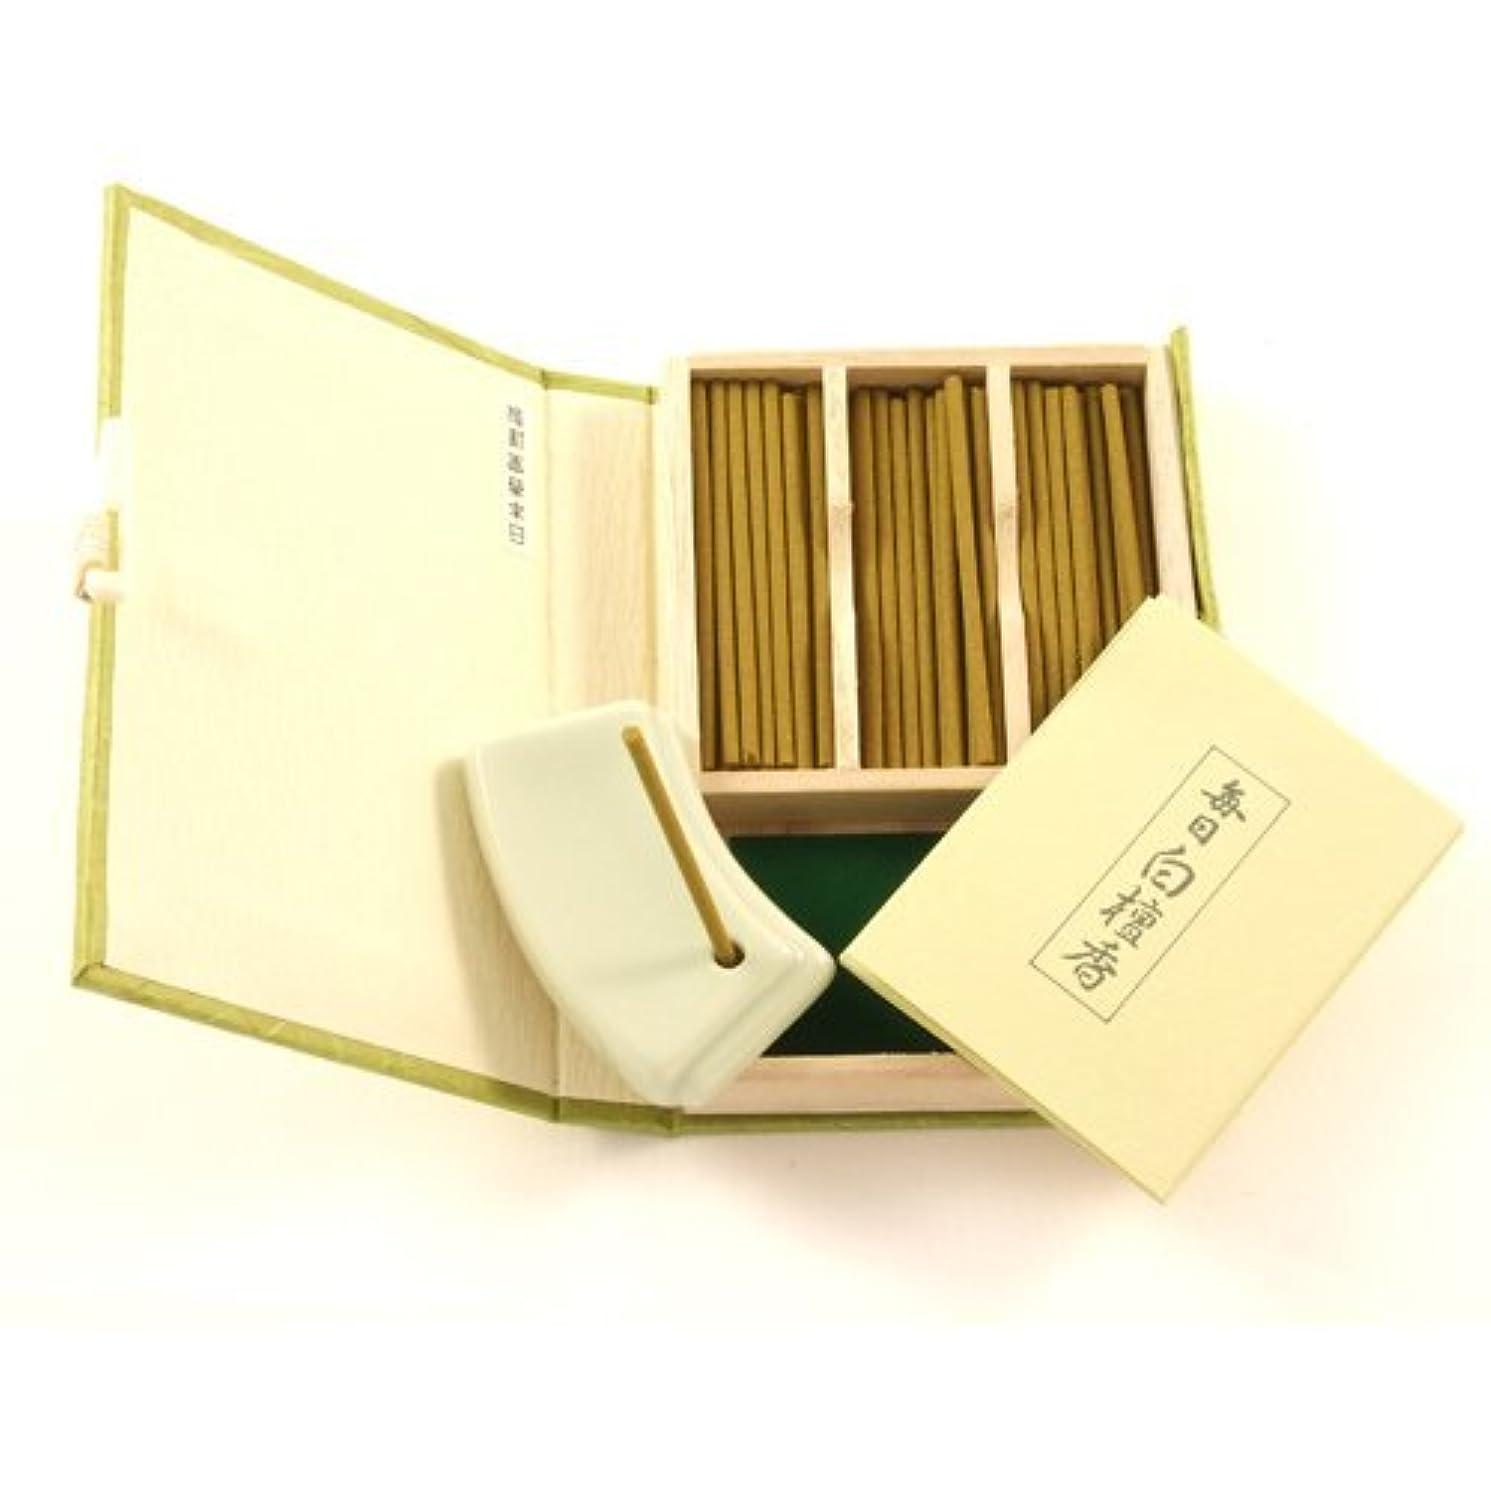 Japanese Sandalwood Incense Gift Set Mainichi Byakudan by Nippon [並行輸入品]